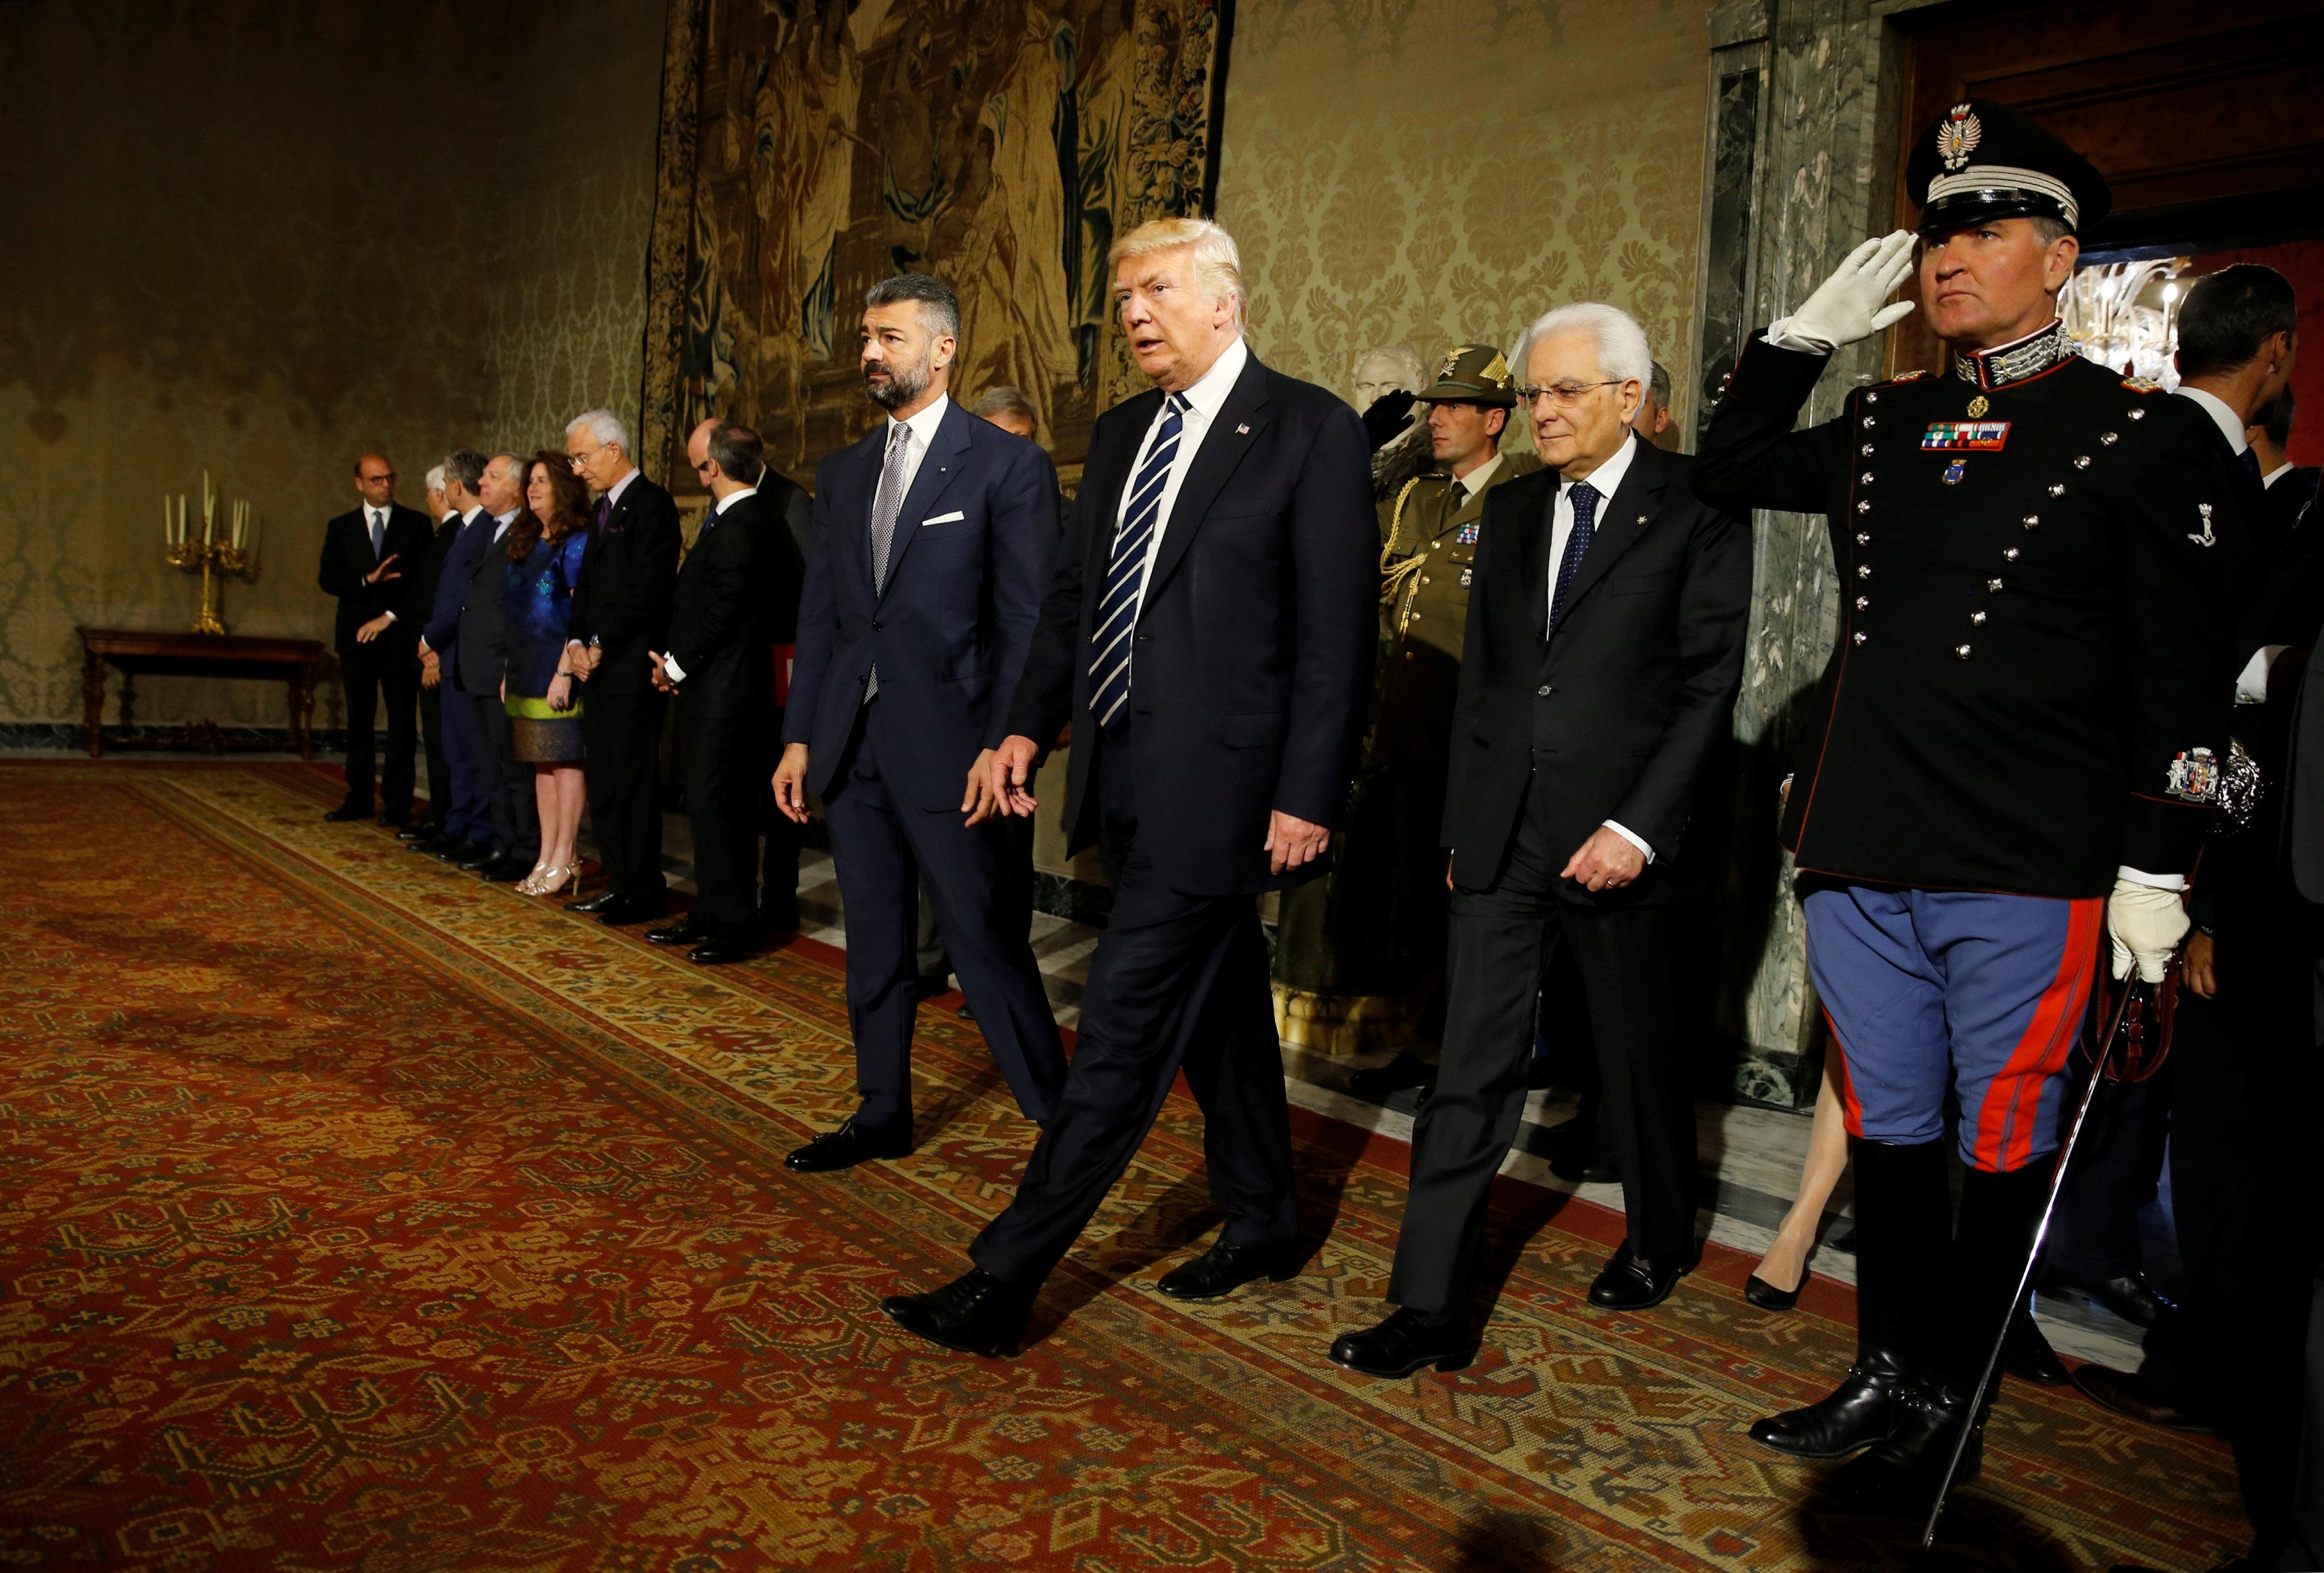 U.S. President Donald Trump walks beside Italy's President Sergio Mattarella (2ndR) at the Quirinale...